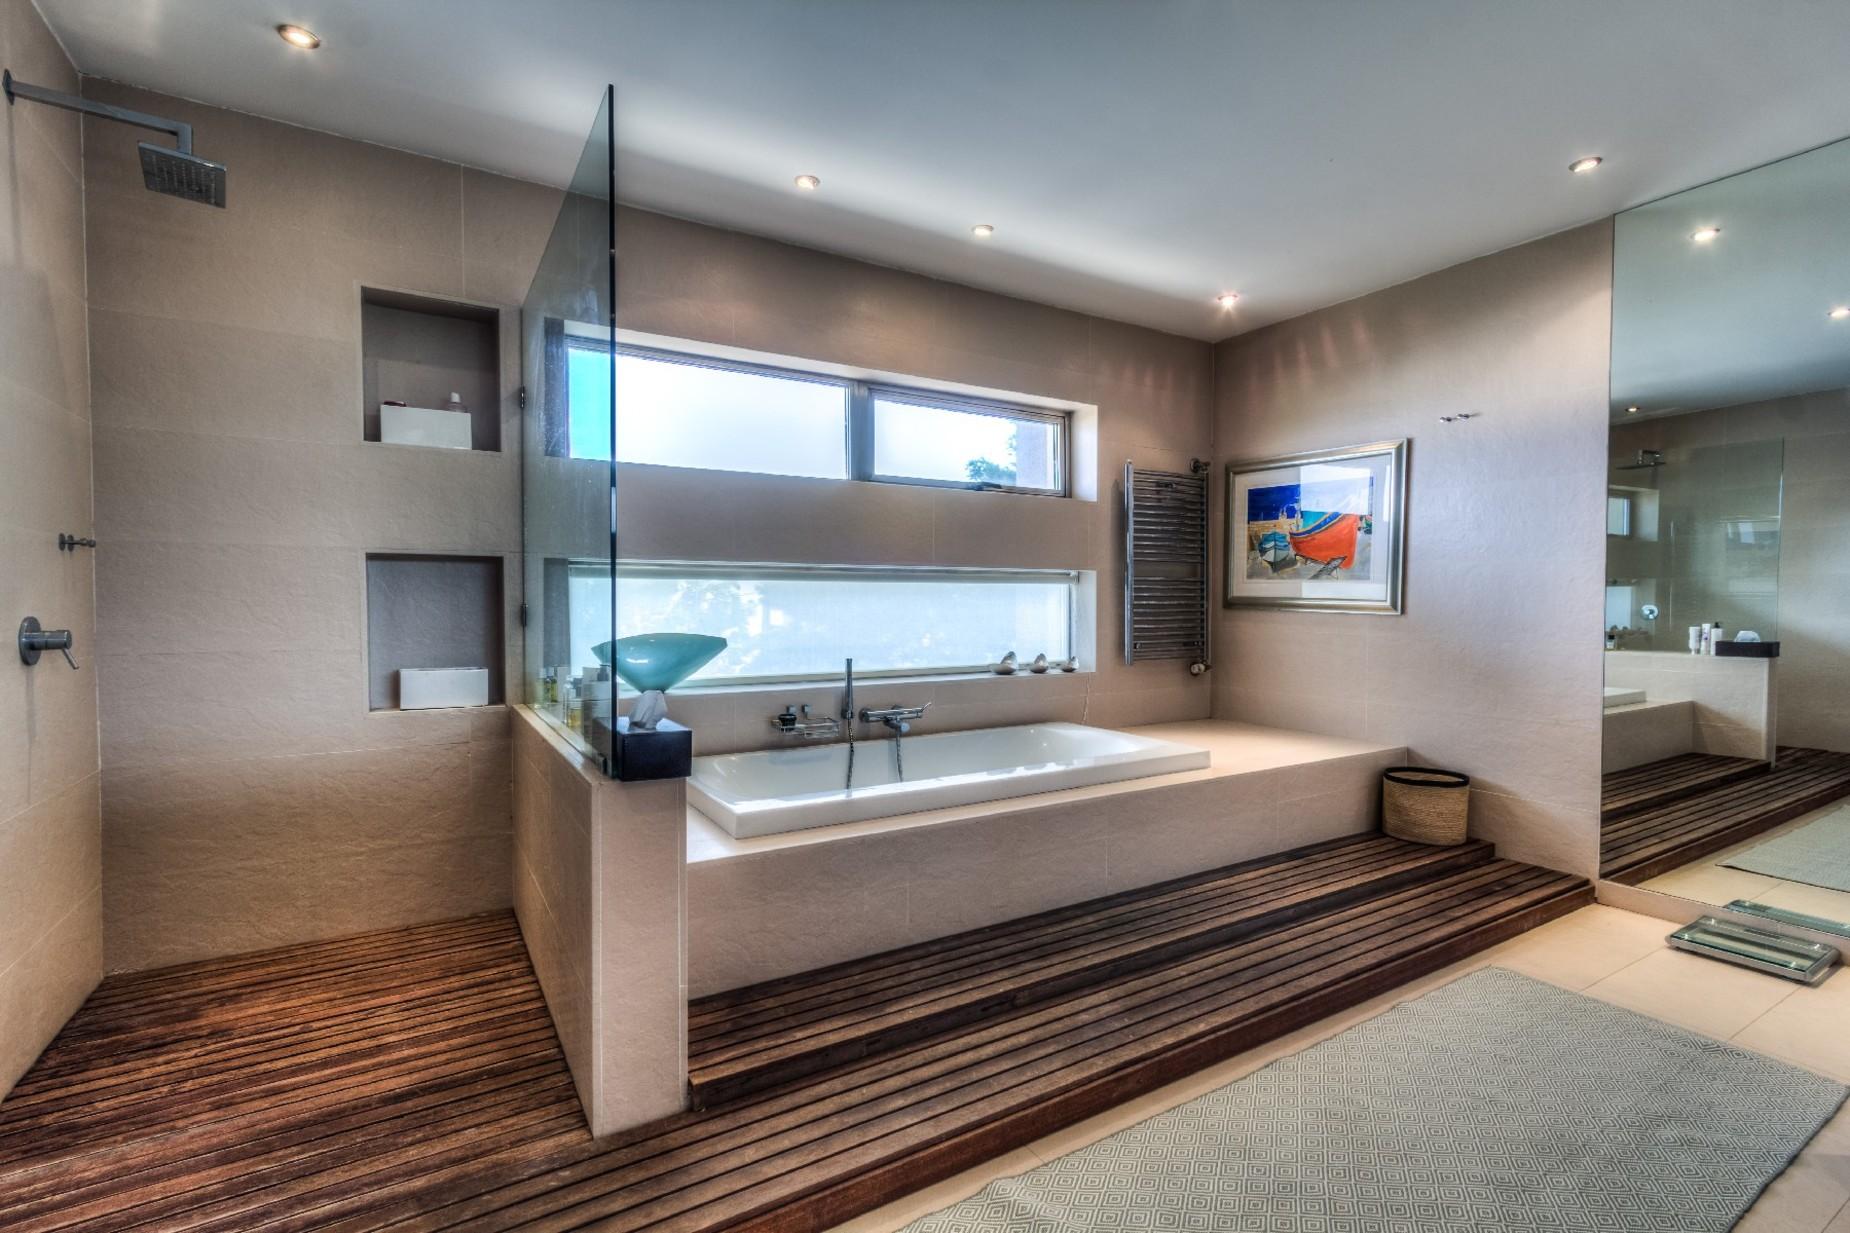 7 bed Villa For Sale in Bahar ic-Caghaq, Bahar ic-Caghaq - thumb 32